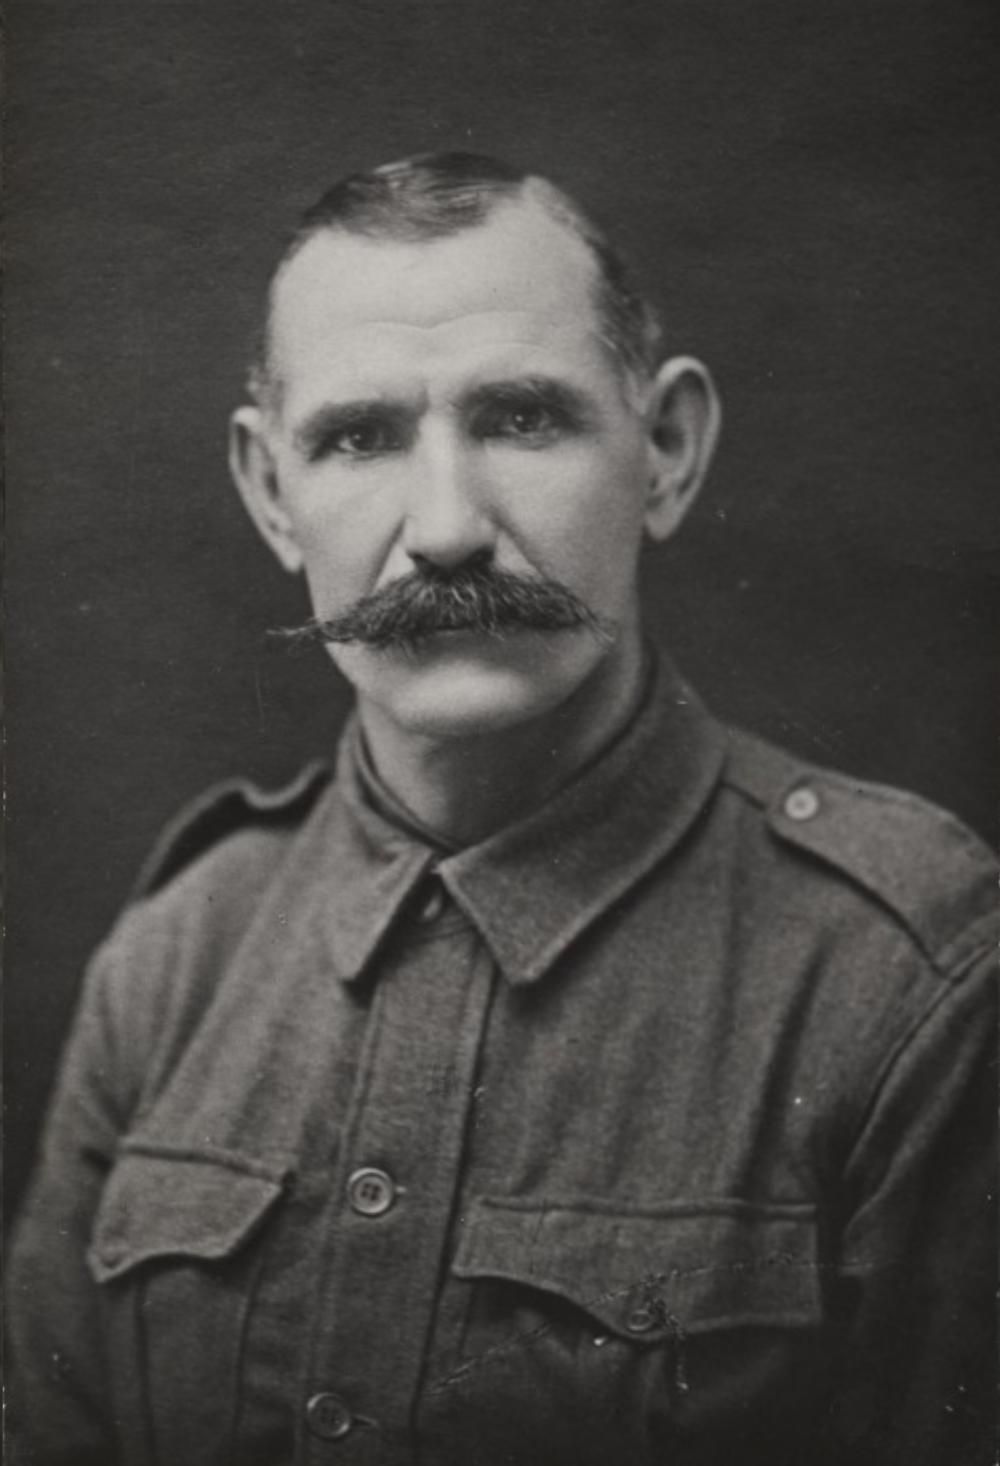 Thomas John 'Jack' Don on enlistment, 1916. Courtesy State Library of Western Australia